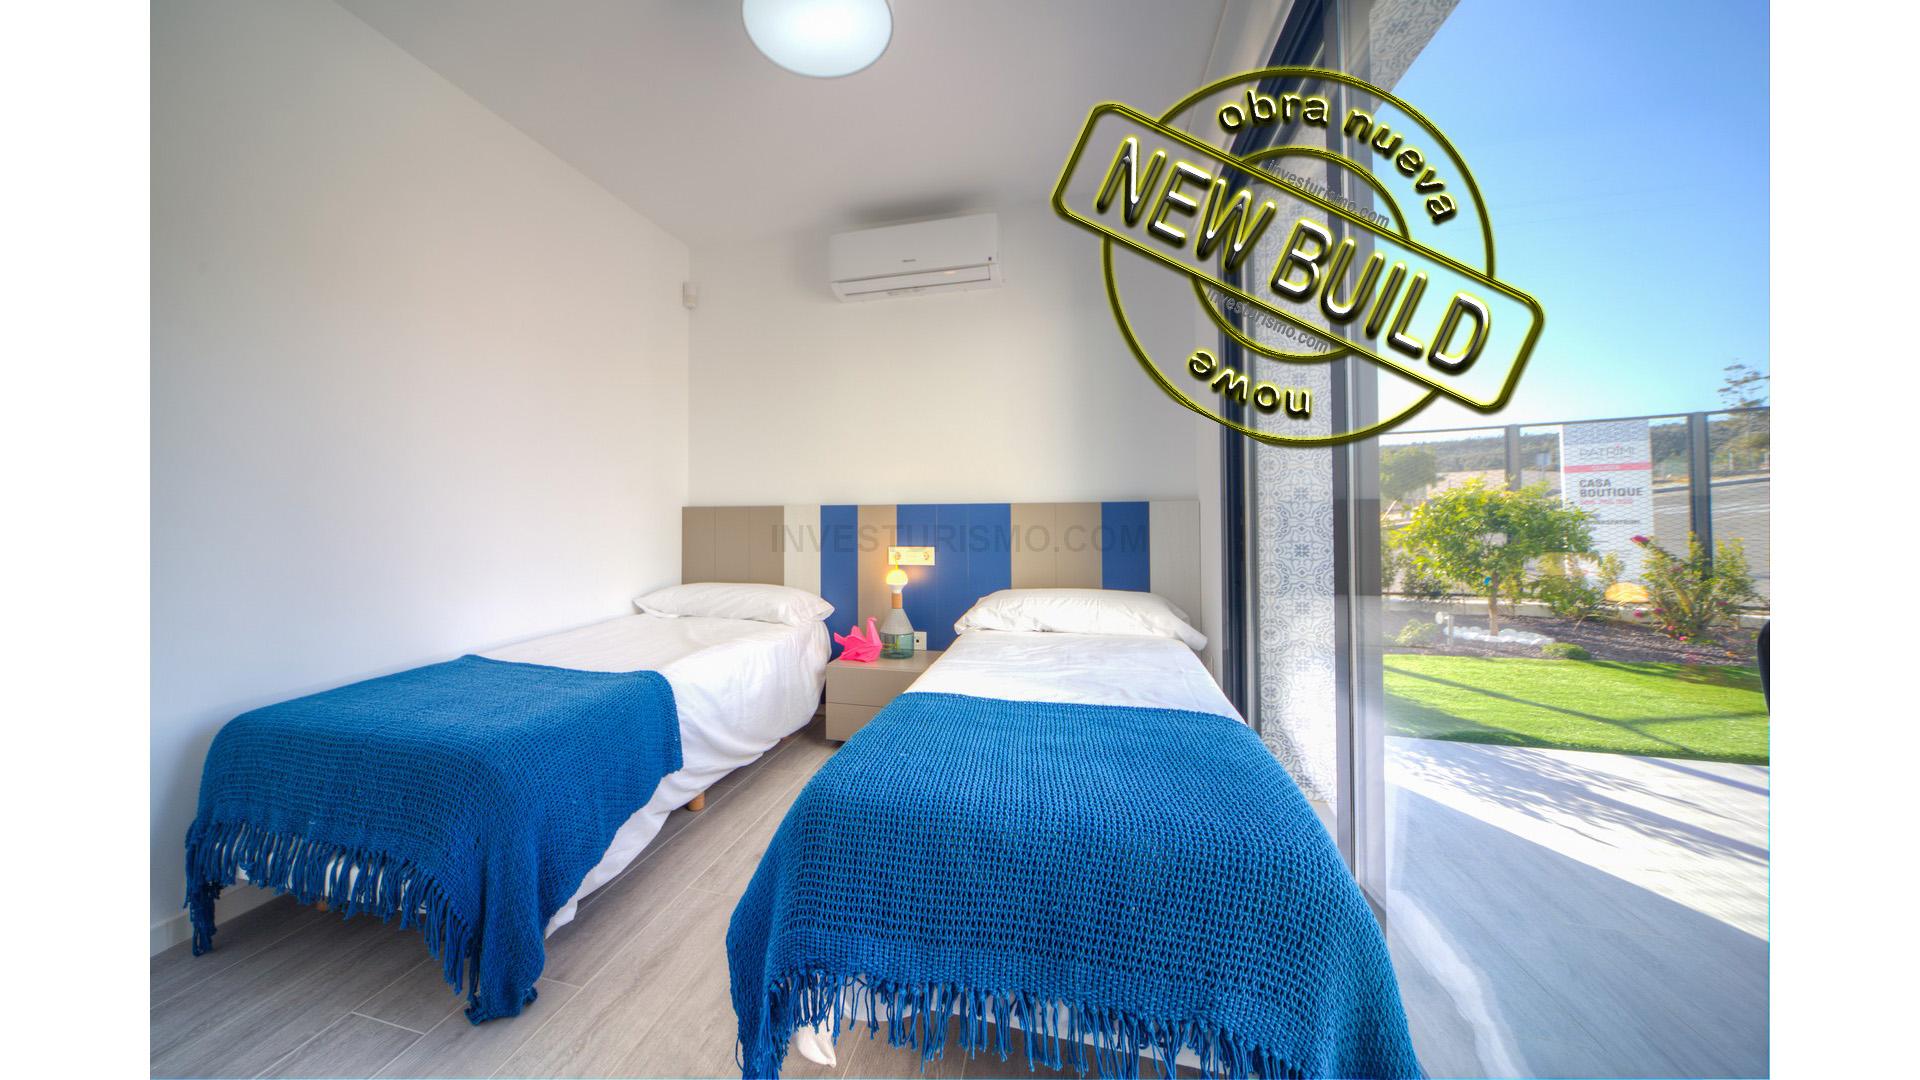 New Build villa 3 bedrooms in Orihuela Costa